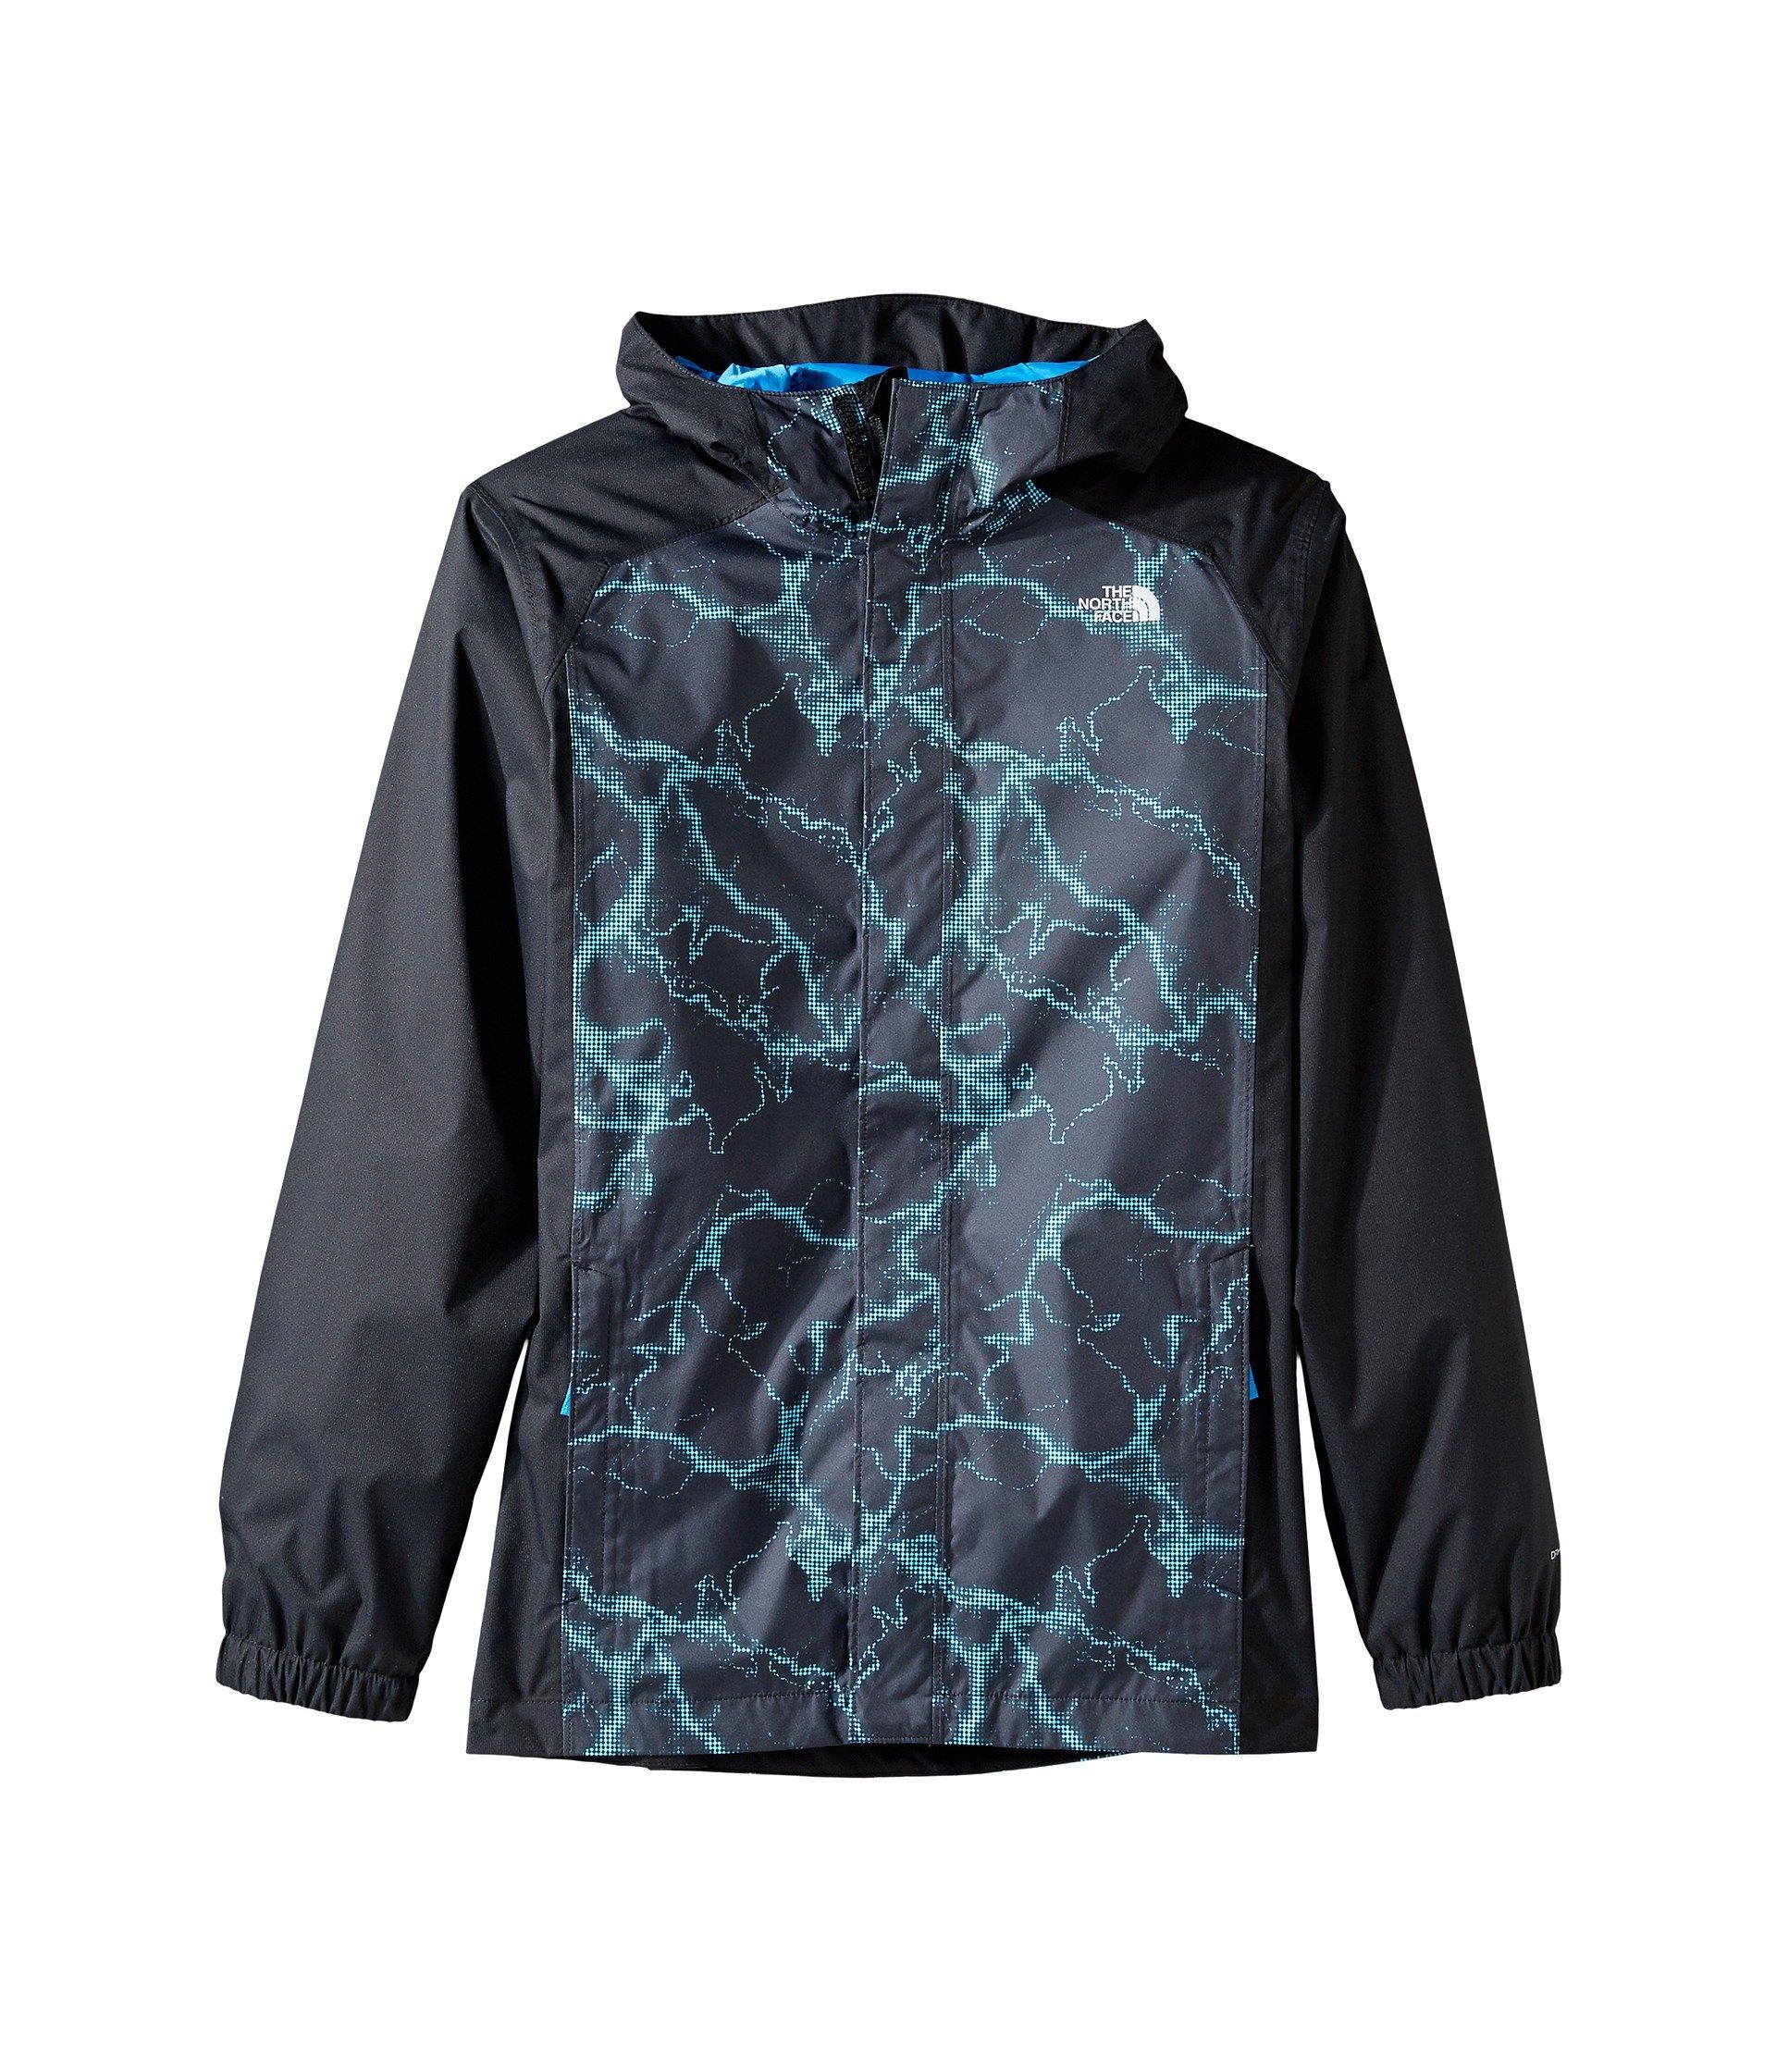 The North Face Boys' Resolve Reflective Jacket Cascade Blue Lightning Print M